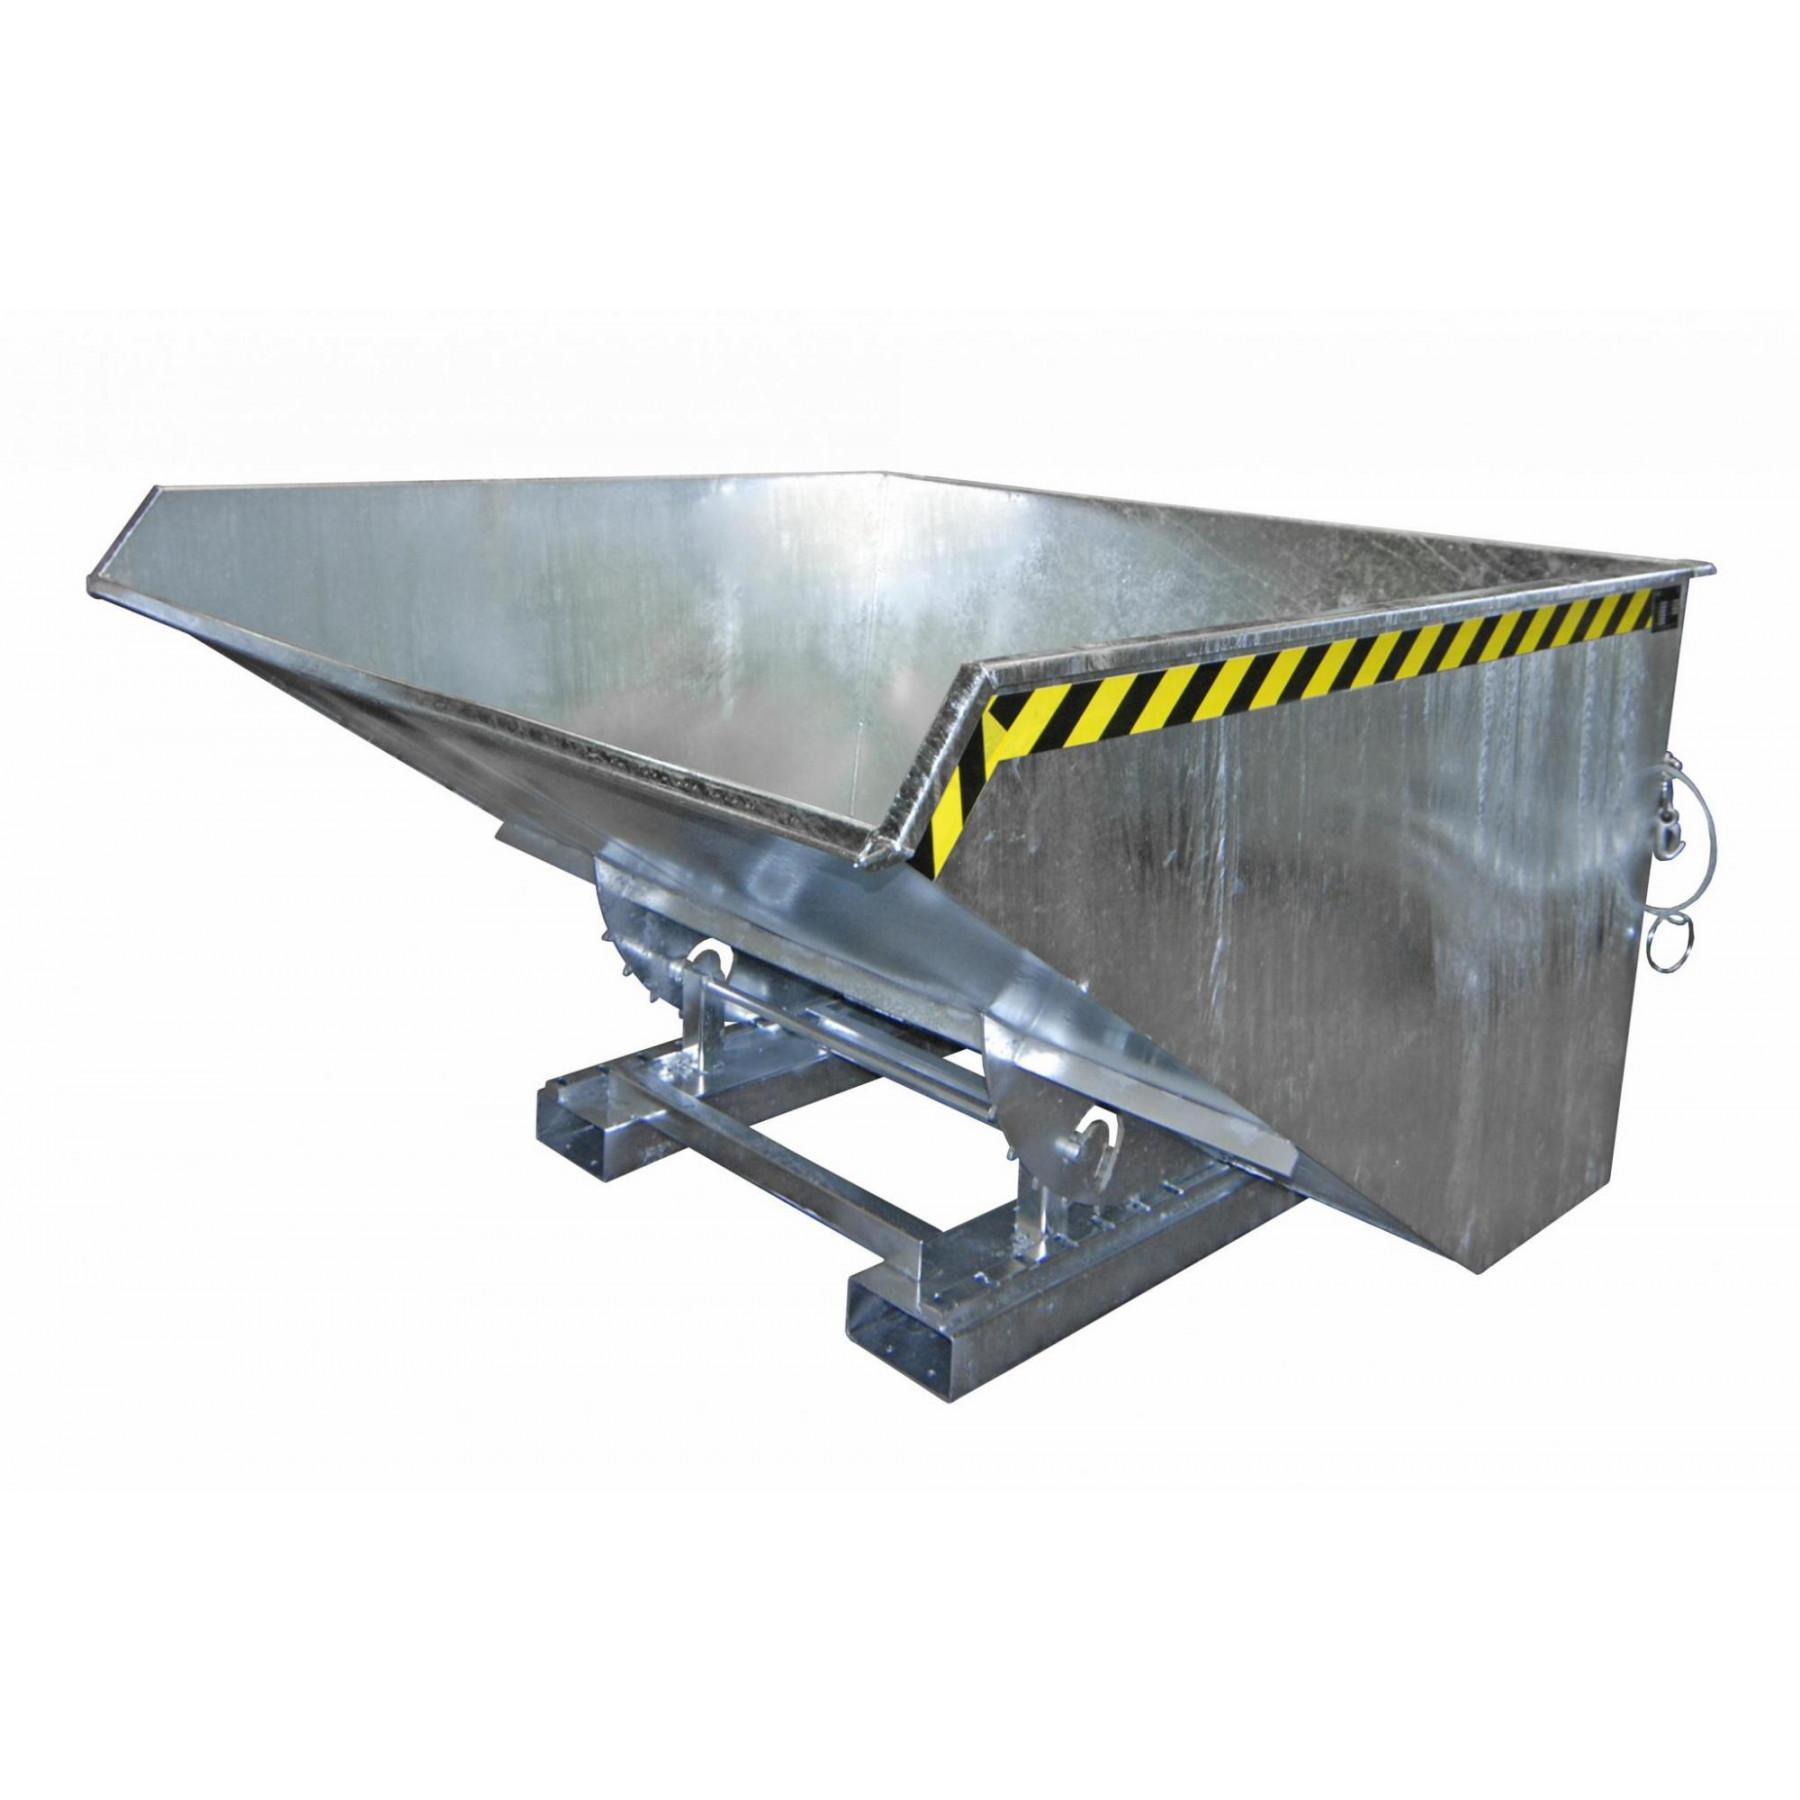 Kiepcontainer 2100 liter, hoog model, MTF-2100-V